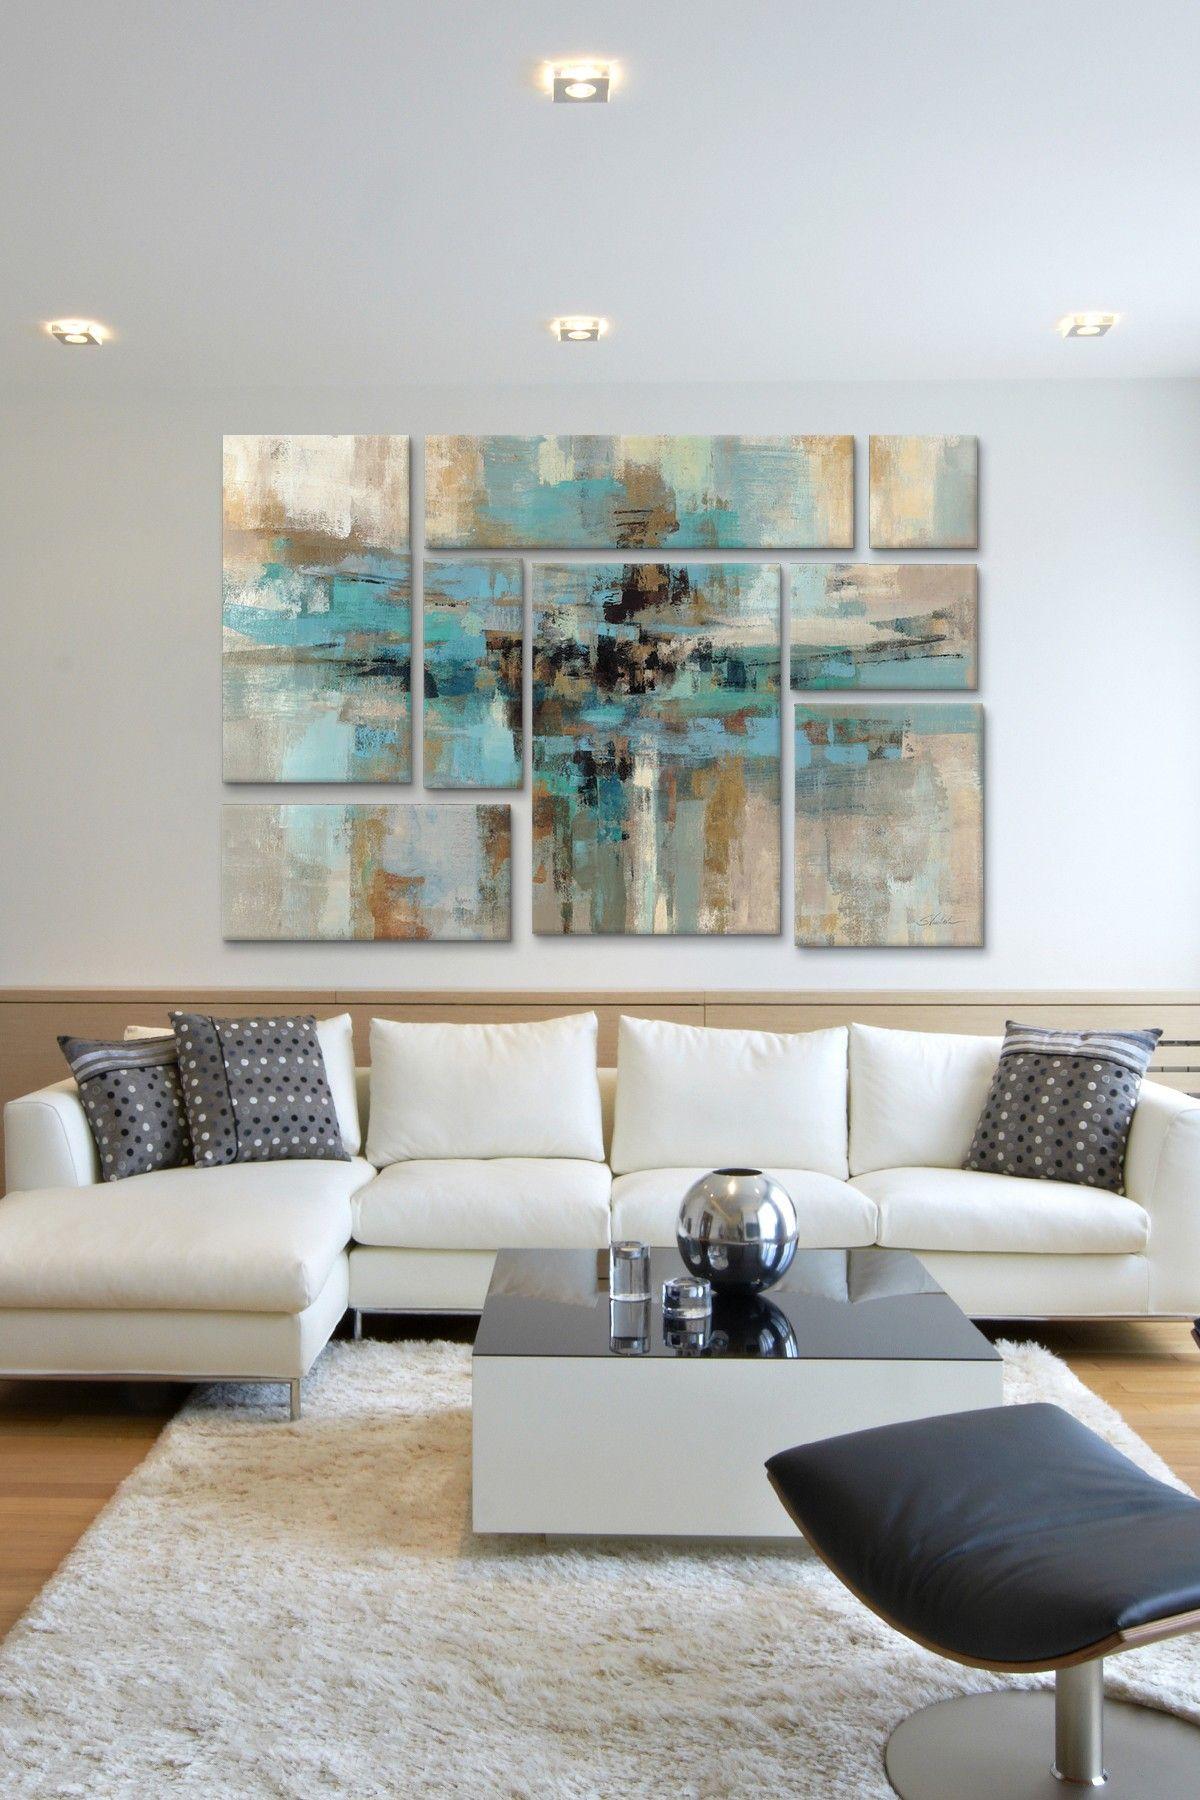 Morning fjord panel sectional wall art on hautelook house ideas